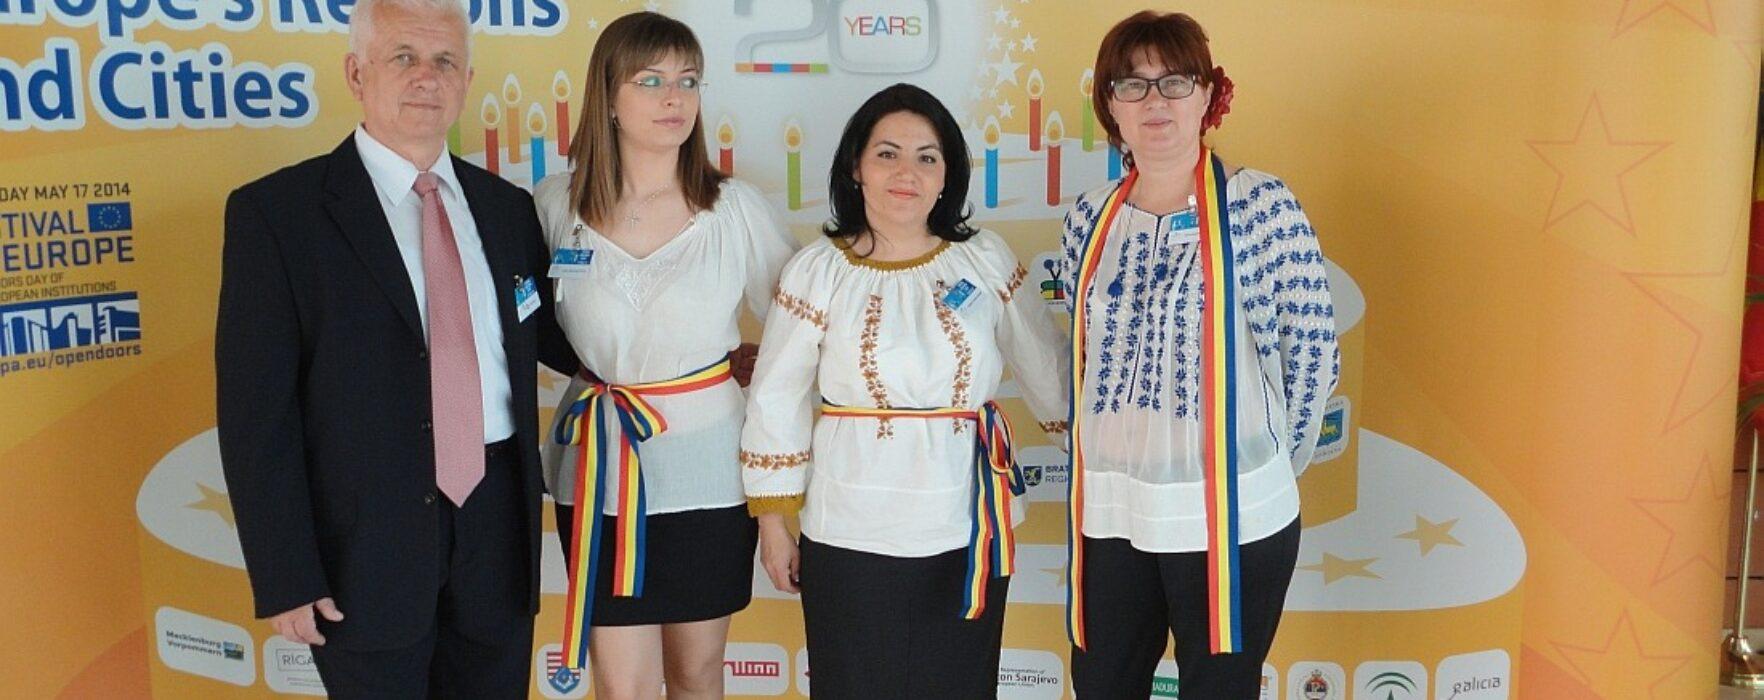 Județul Dâmbovița, reprezentat la Festivalul Regiunilor de la Bruxelles